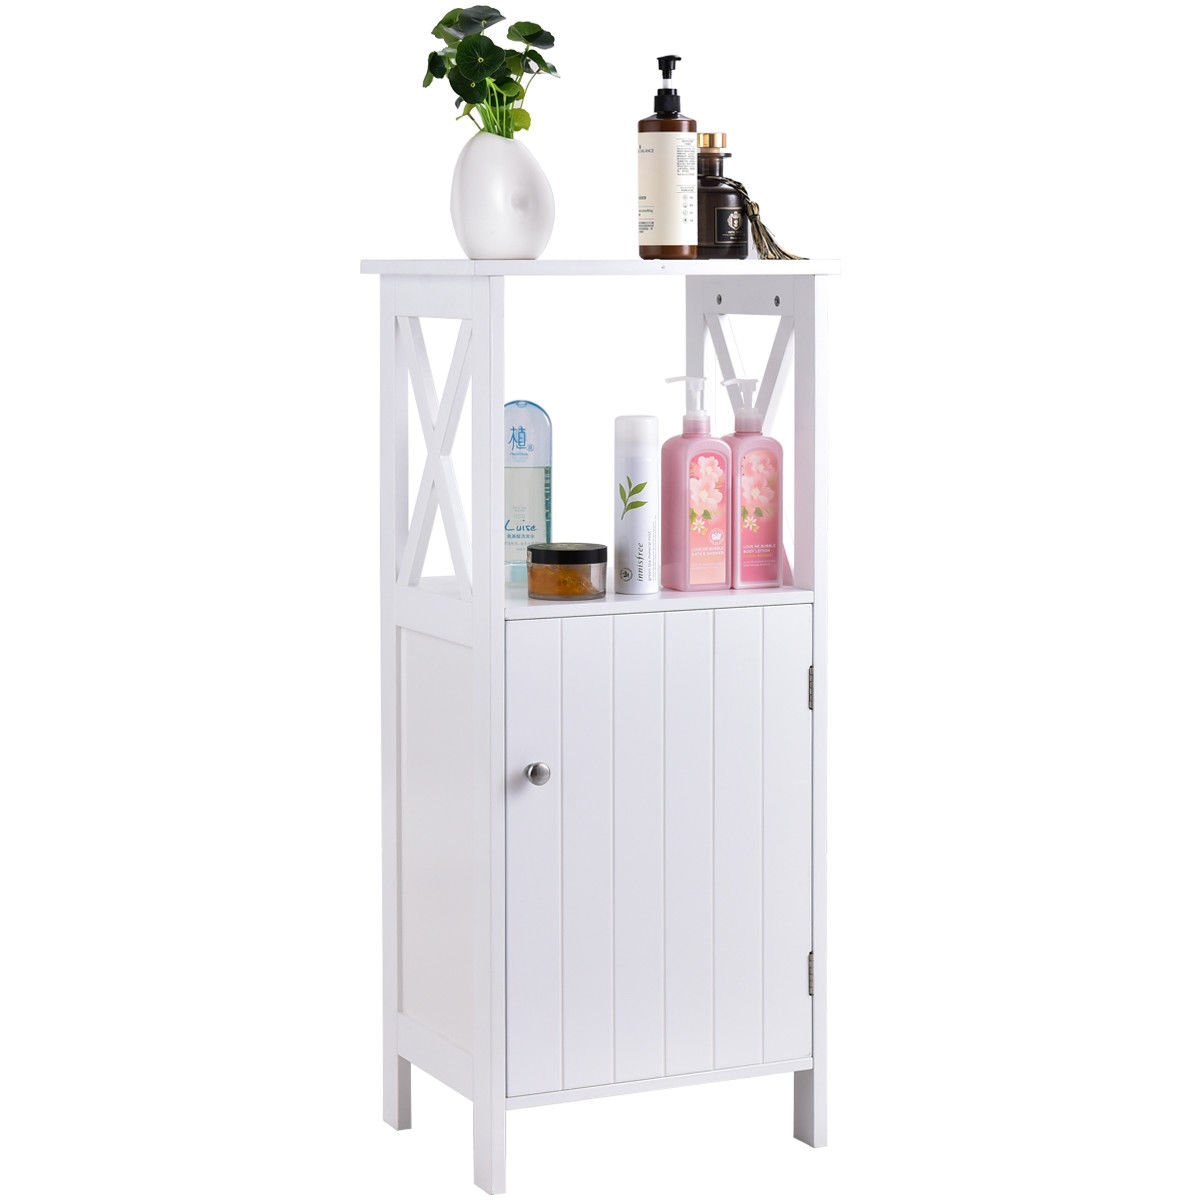 Globe House Products GHP 16''x12''x36.5'' White Pine & Wood Single Door Bathroom Storage Floor Cabinet